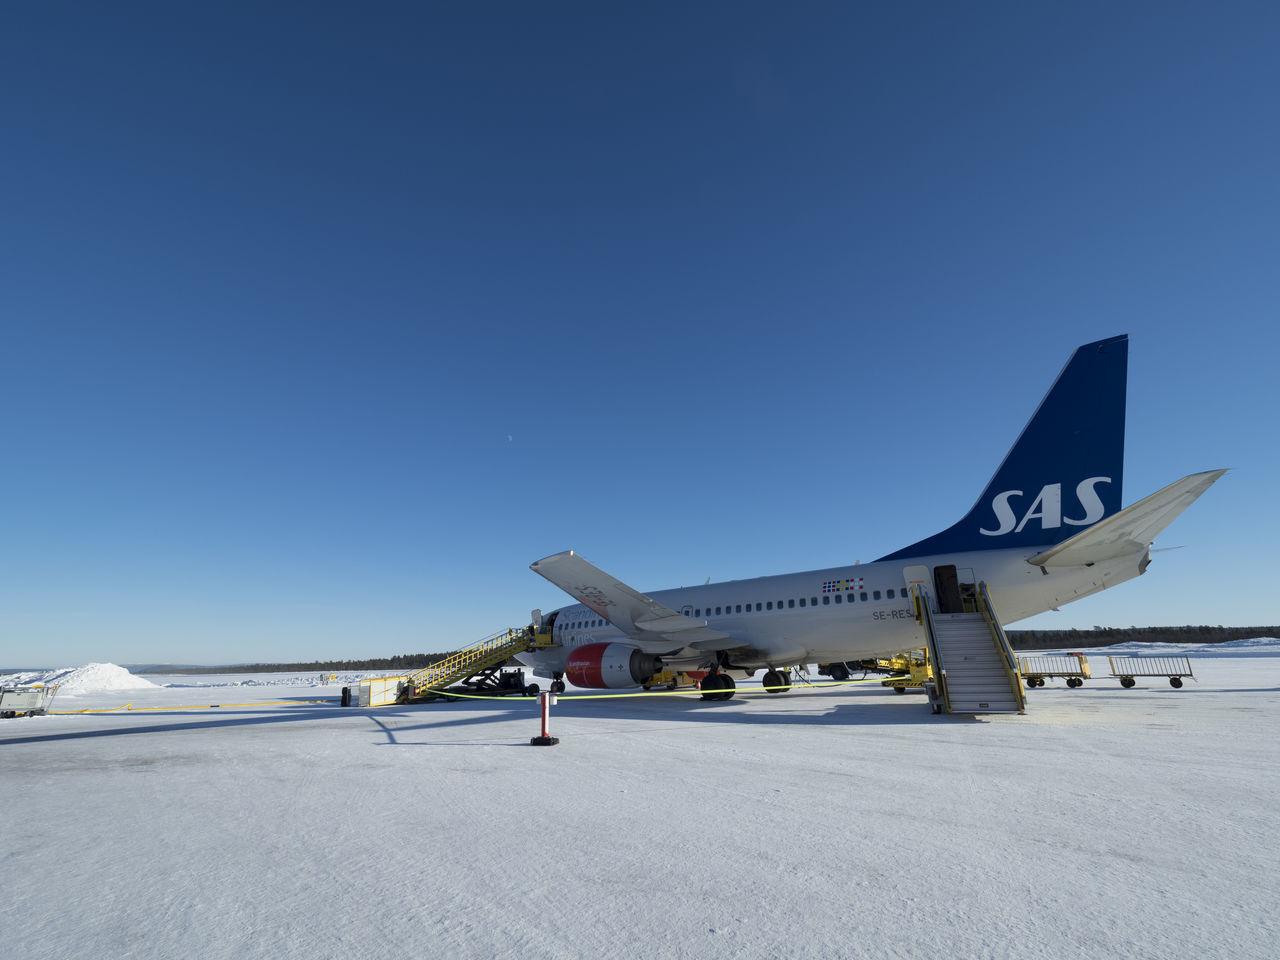 Aerospace Industry Air Vehicle Airplane Airport Airport Runway Kiruna No People Outdoors Passenger Boarding Bridge Sas Scandinavian Scandinavian Airlines Snow Winter